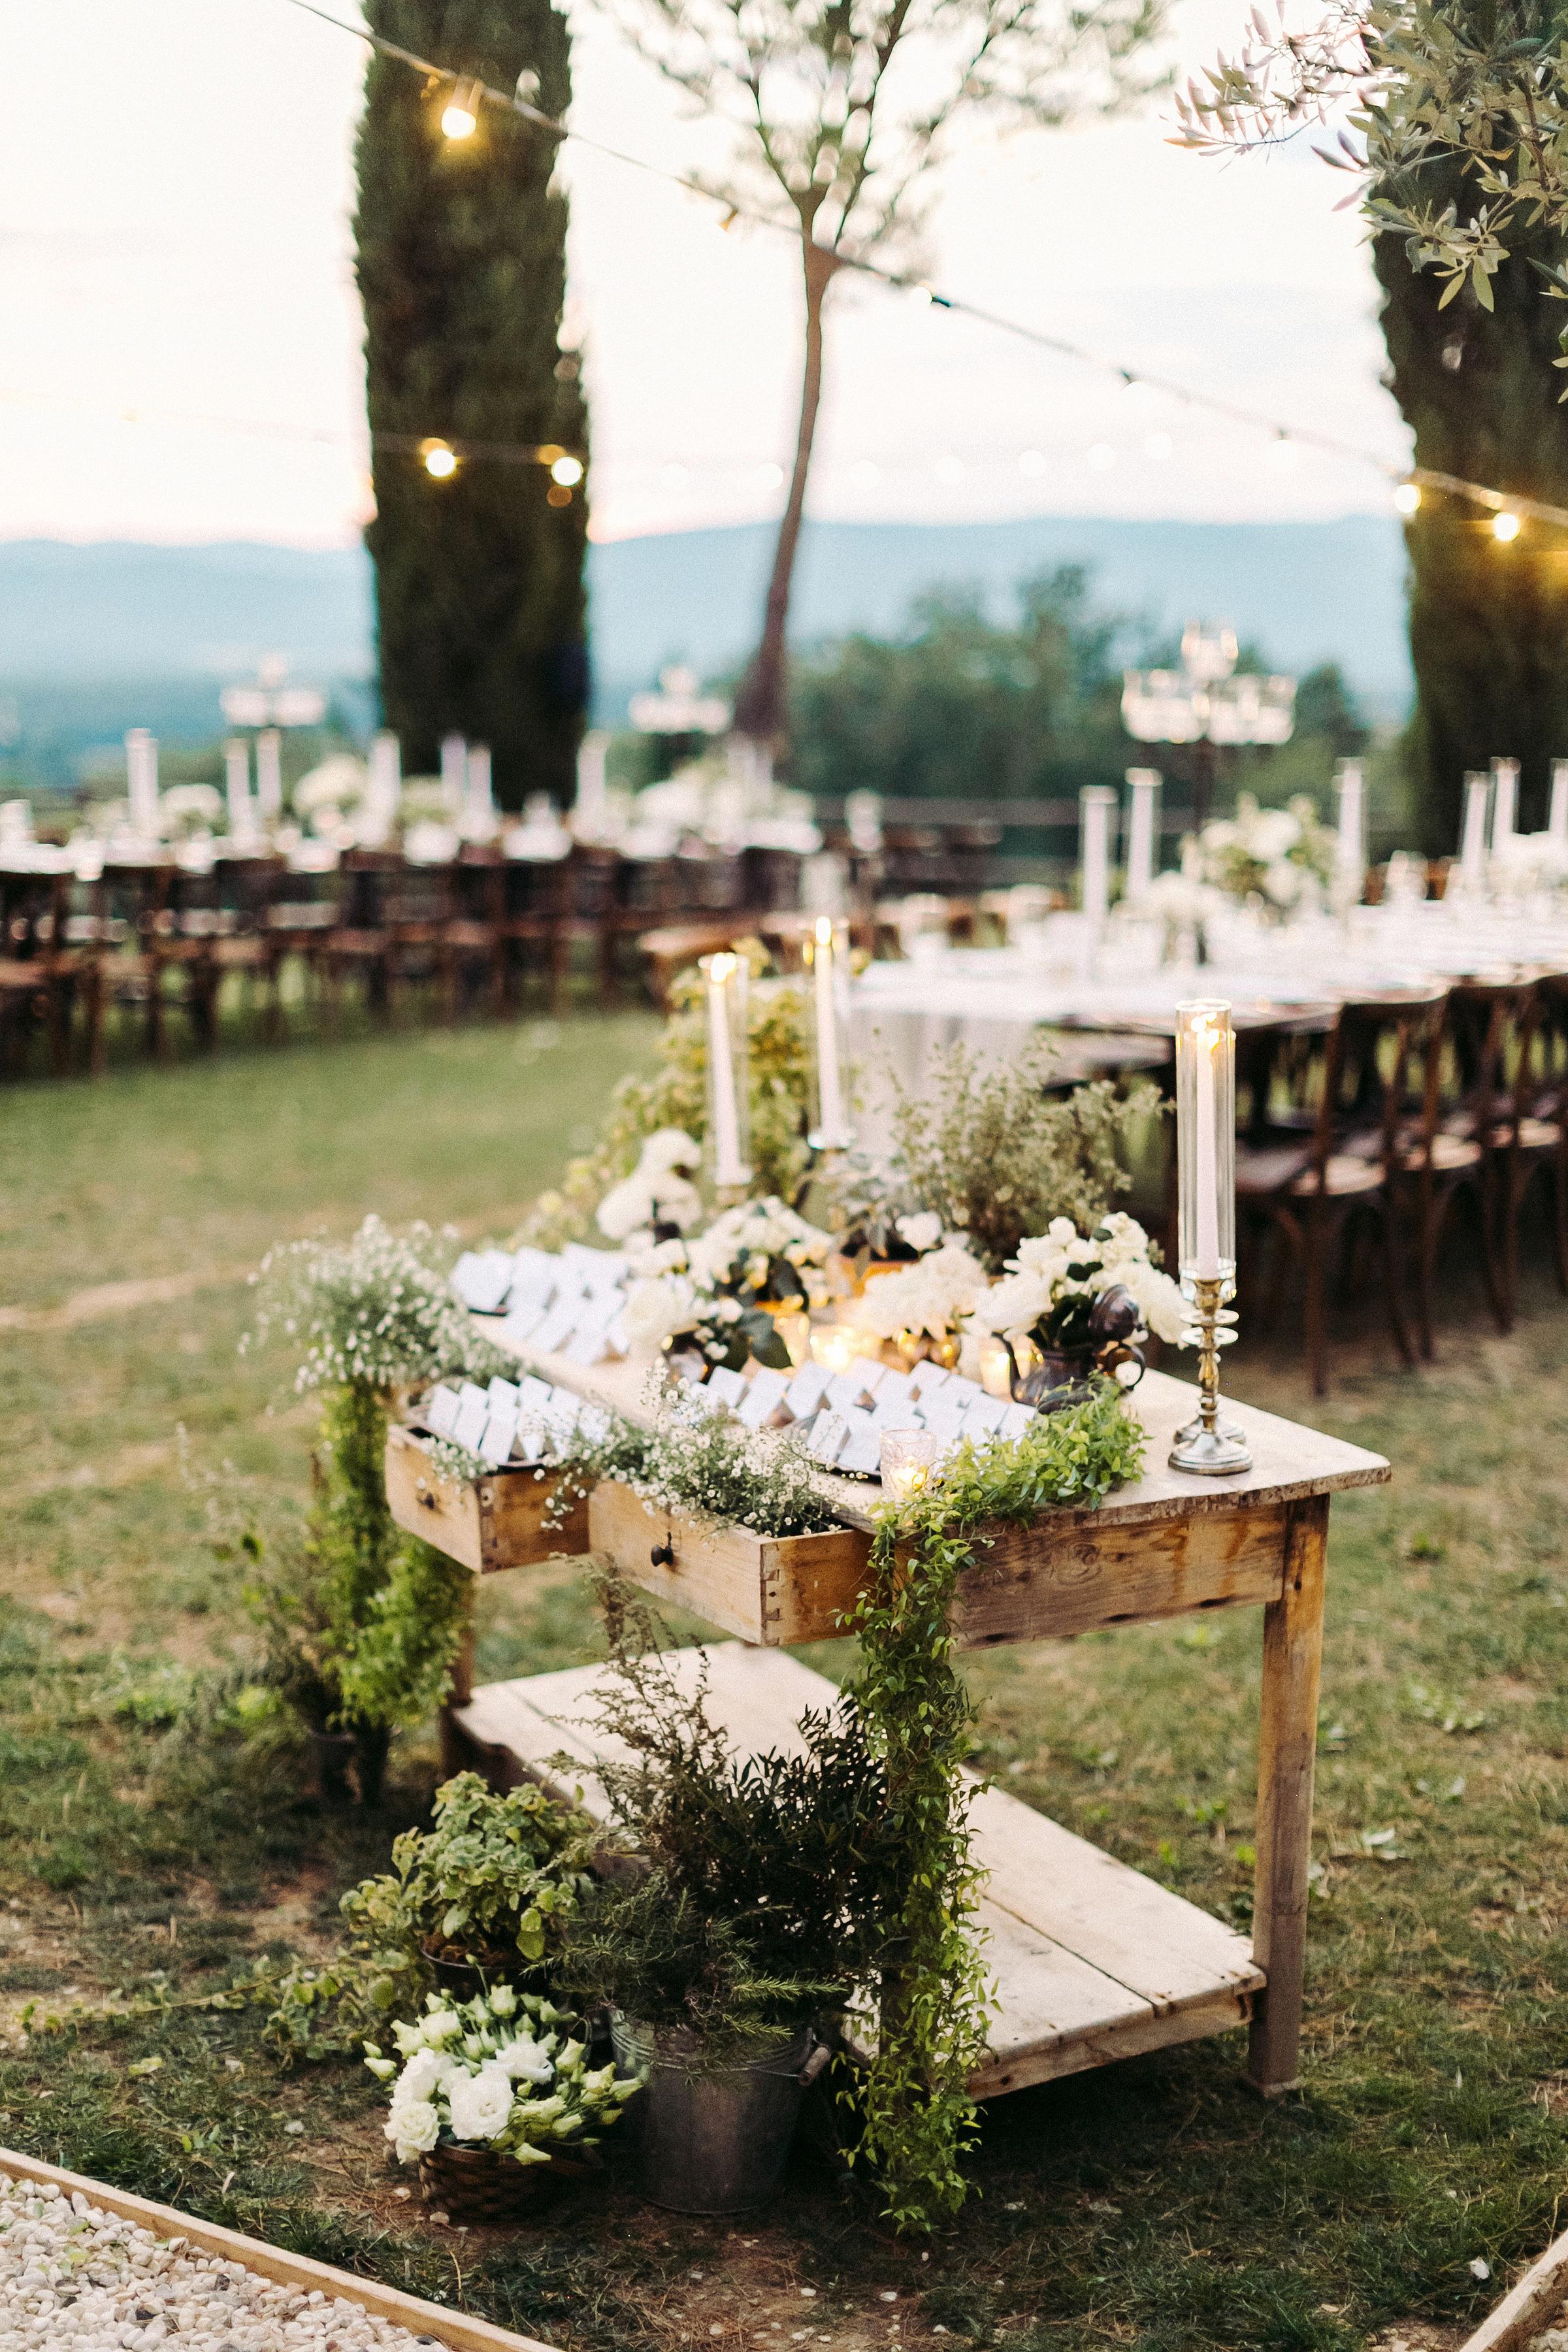 kseniya sadhir wedding escort card display table